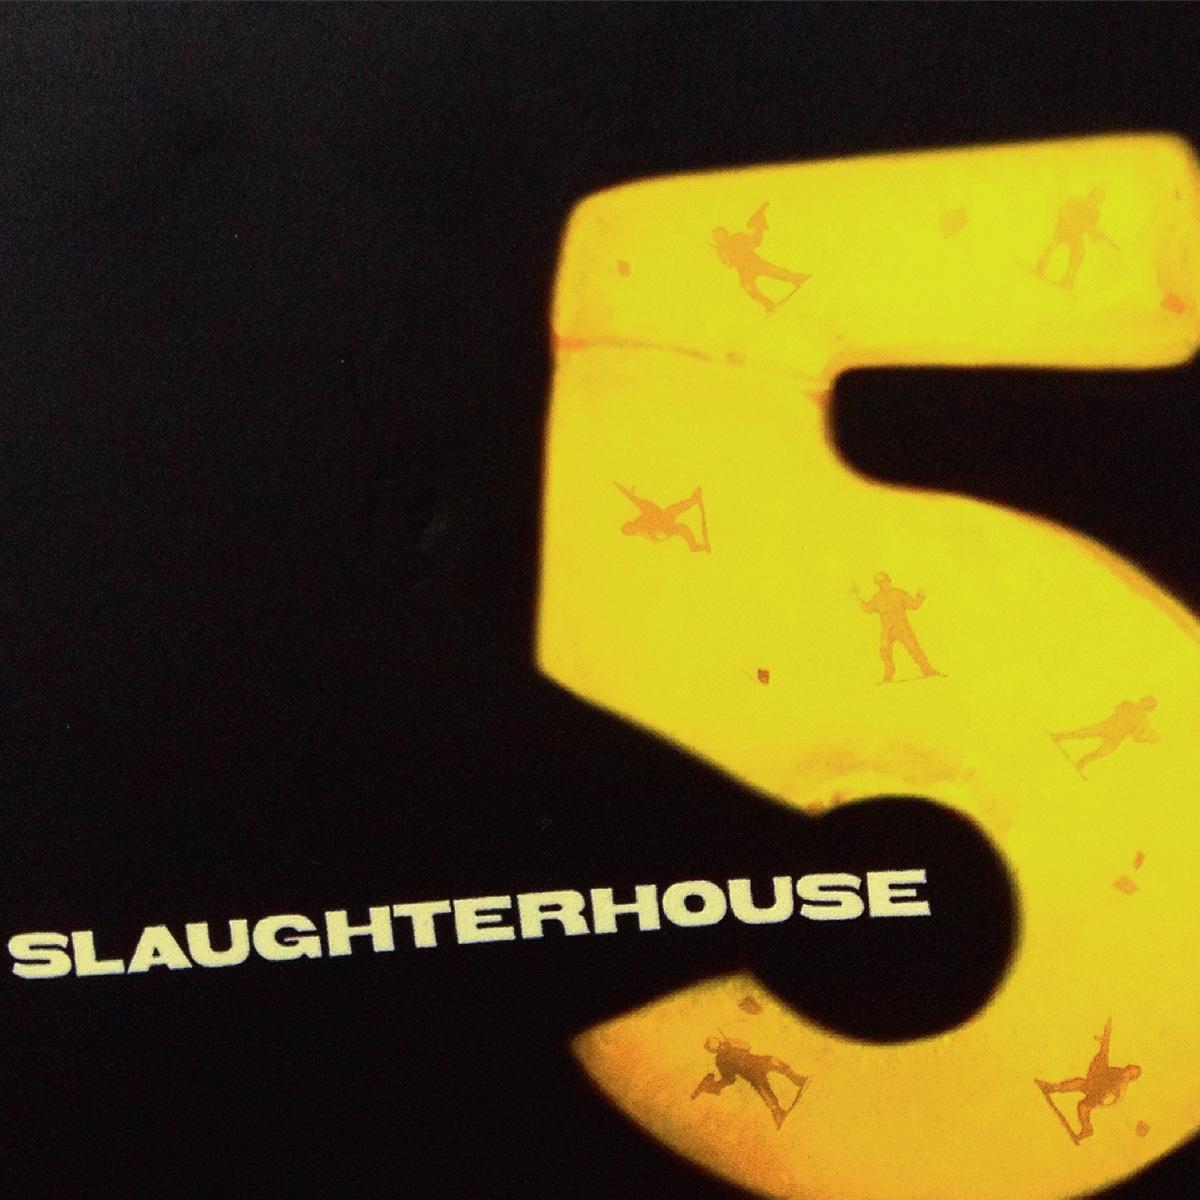 Slaughterhouse 5 - Kurt Vonnegut 1991 PB